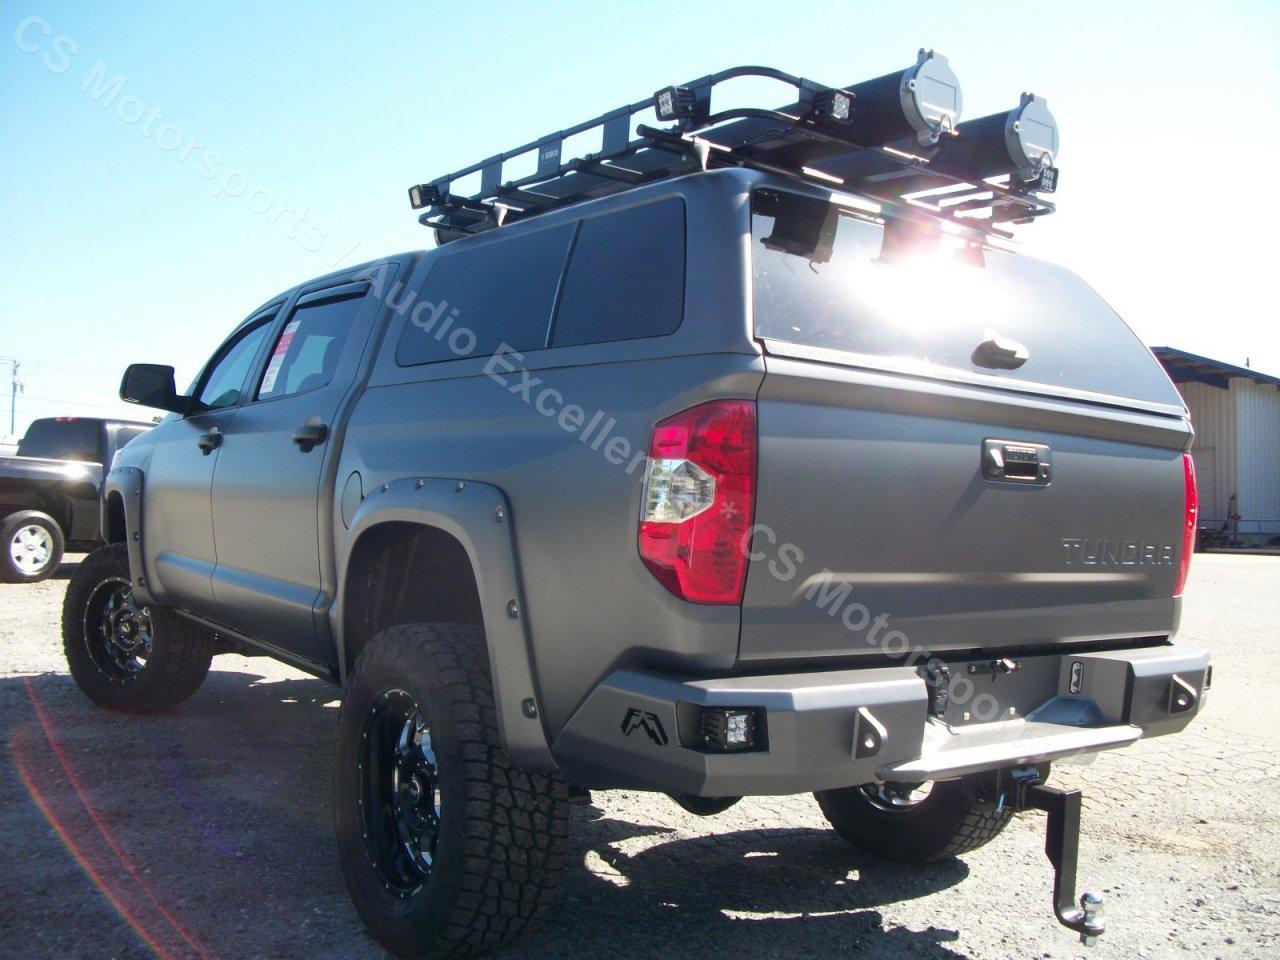 Rod Pod /w Surco Roof Rack